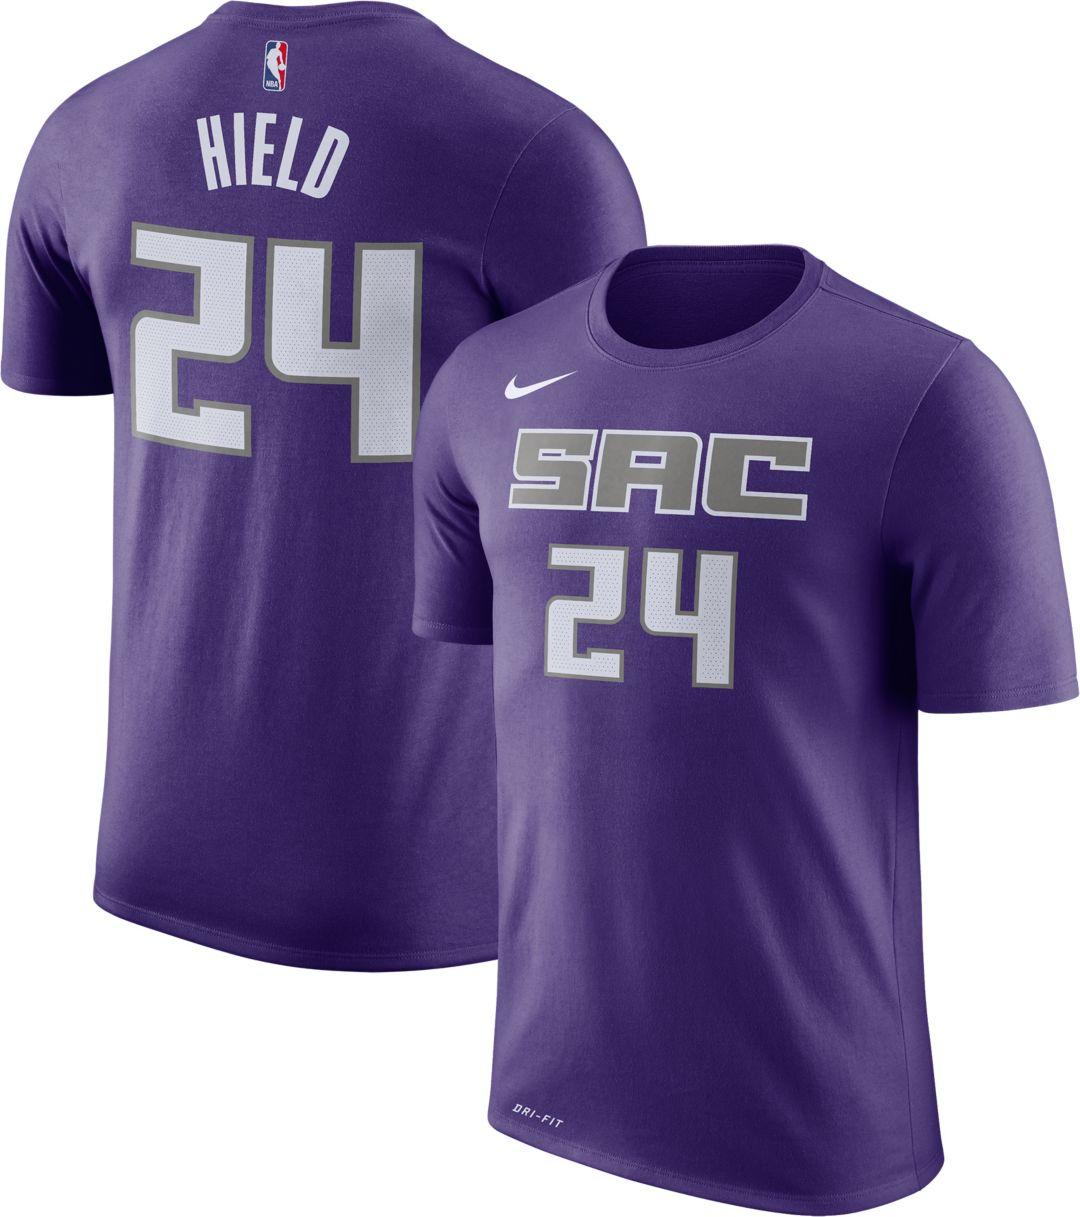 brand new e52f5 3f45a Nike Men's Sacramento Kings Buddy Hield #24 Dri-FIT Purple T-Shirt